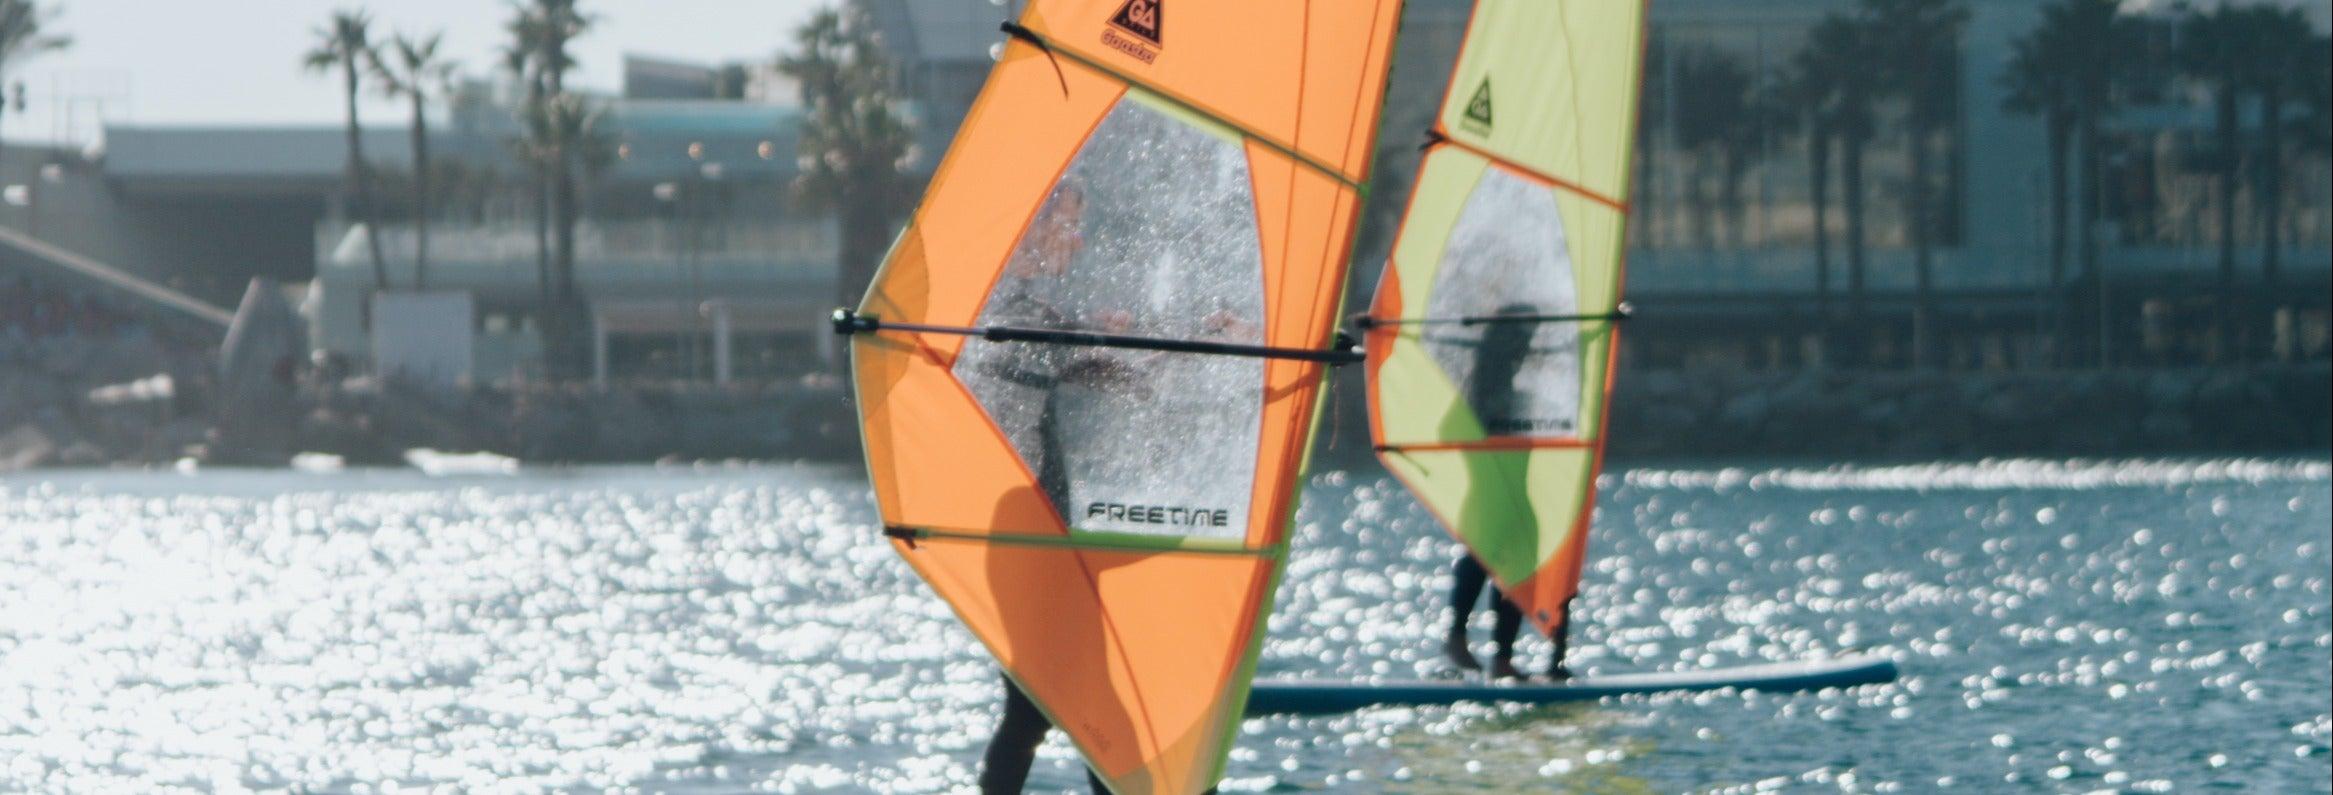 Barcelona Windsurf Lesson